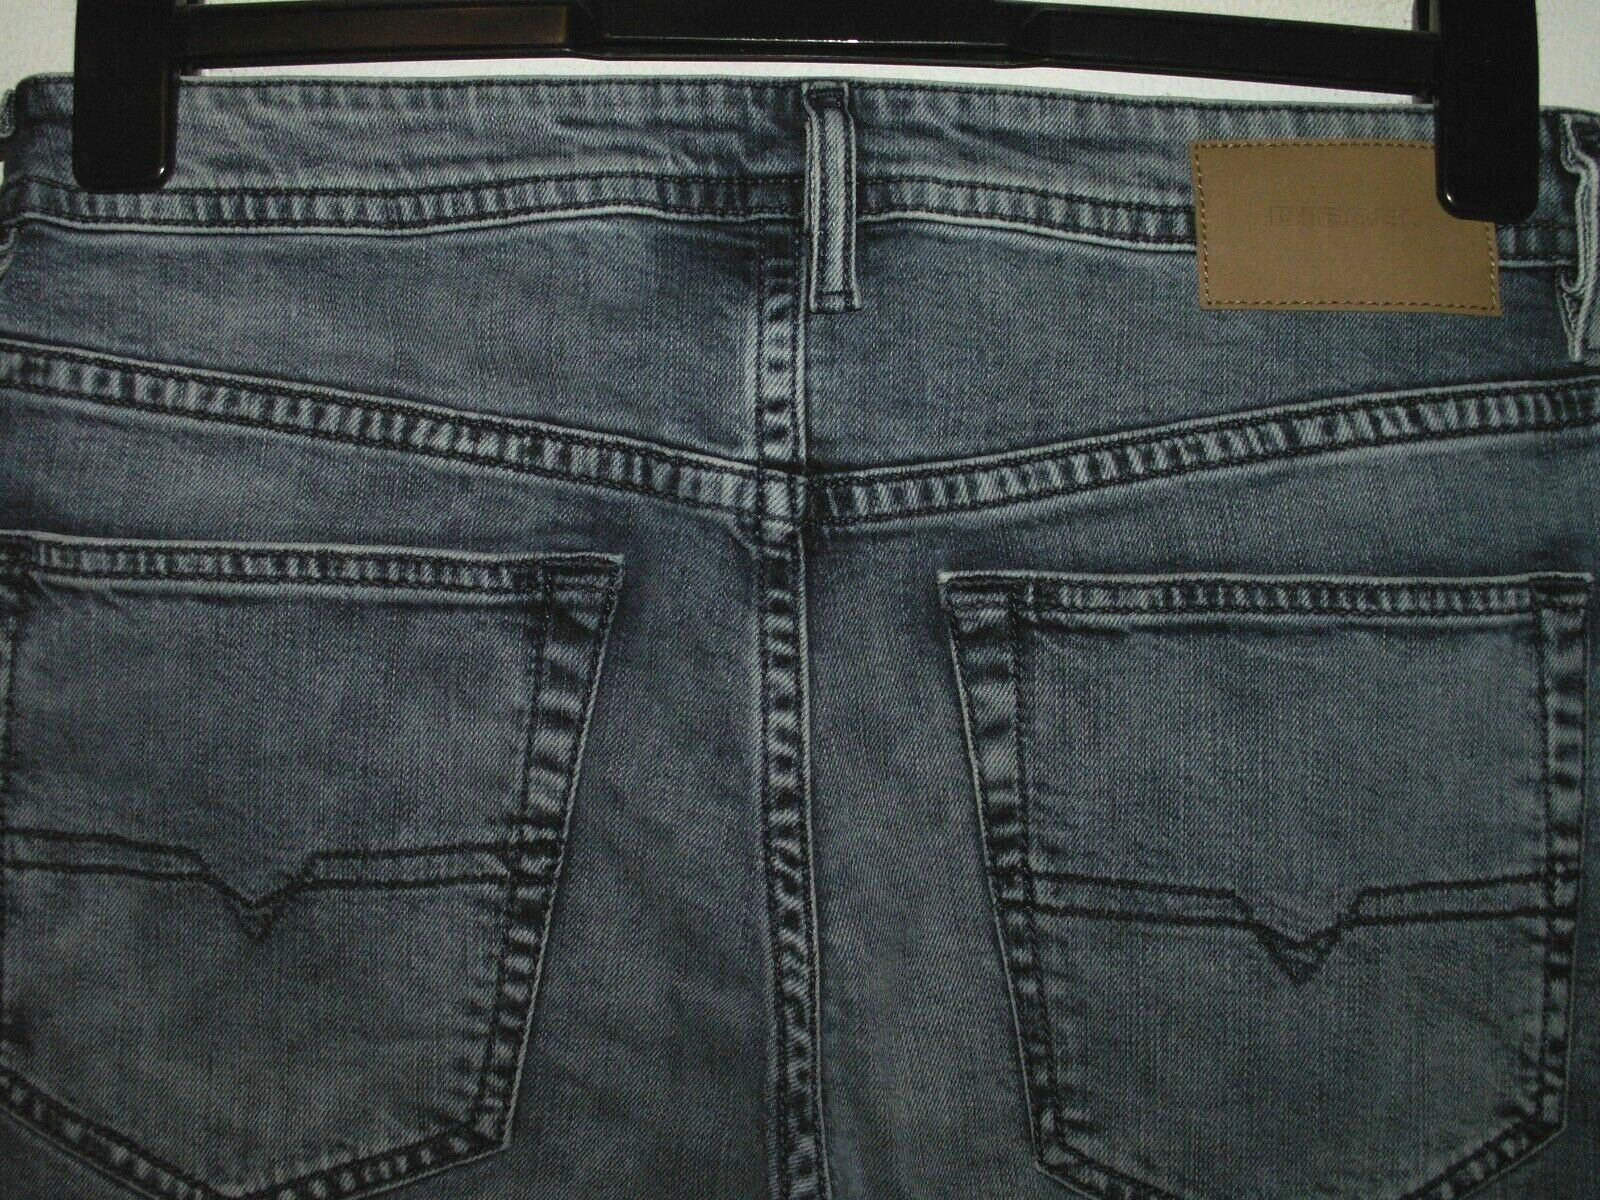 316f65fb DIESEL BUSTER REGULAR FIT JEANS 084UX STRETCH W29 L30 (5875) SLIM-TAPERED  nrmnvs19-Jeans